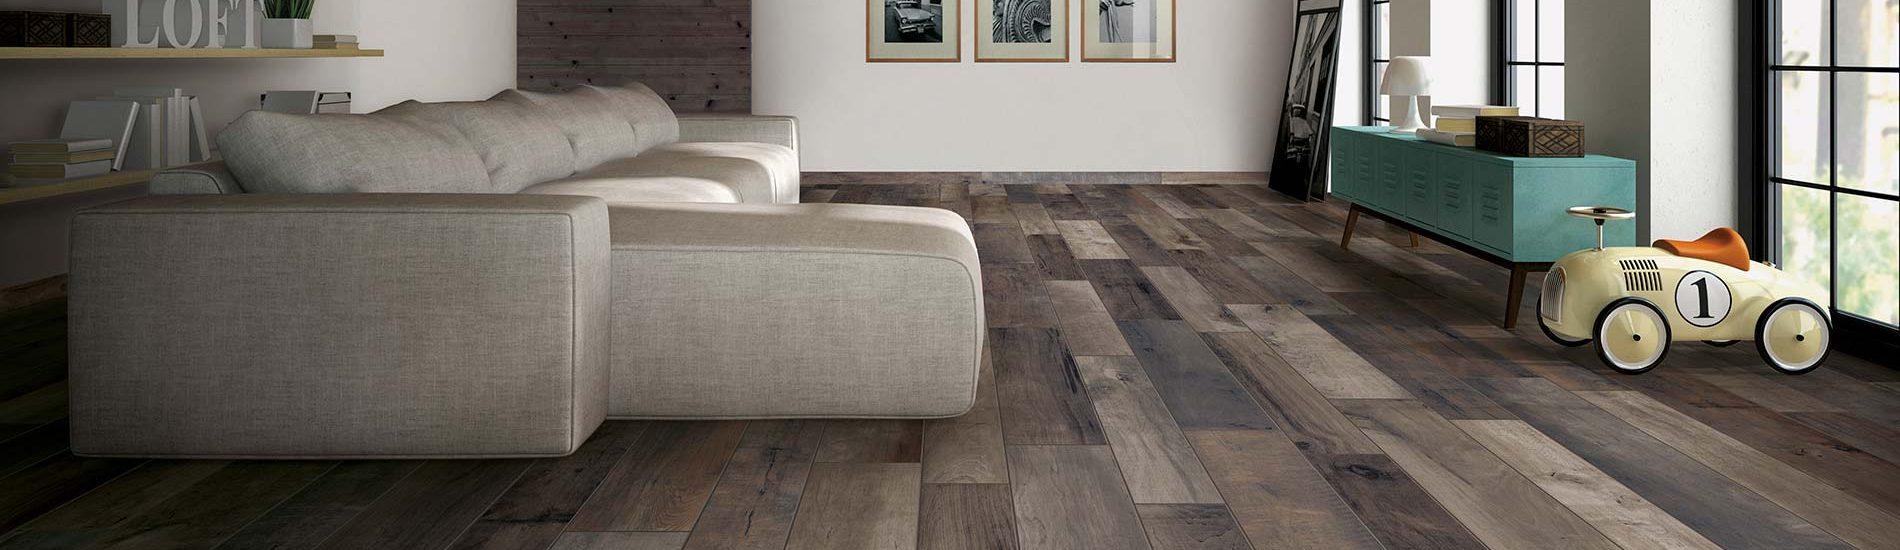 banner-aspen-italian-wood-look-floor-wall-tile-anaheim-flooring-store